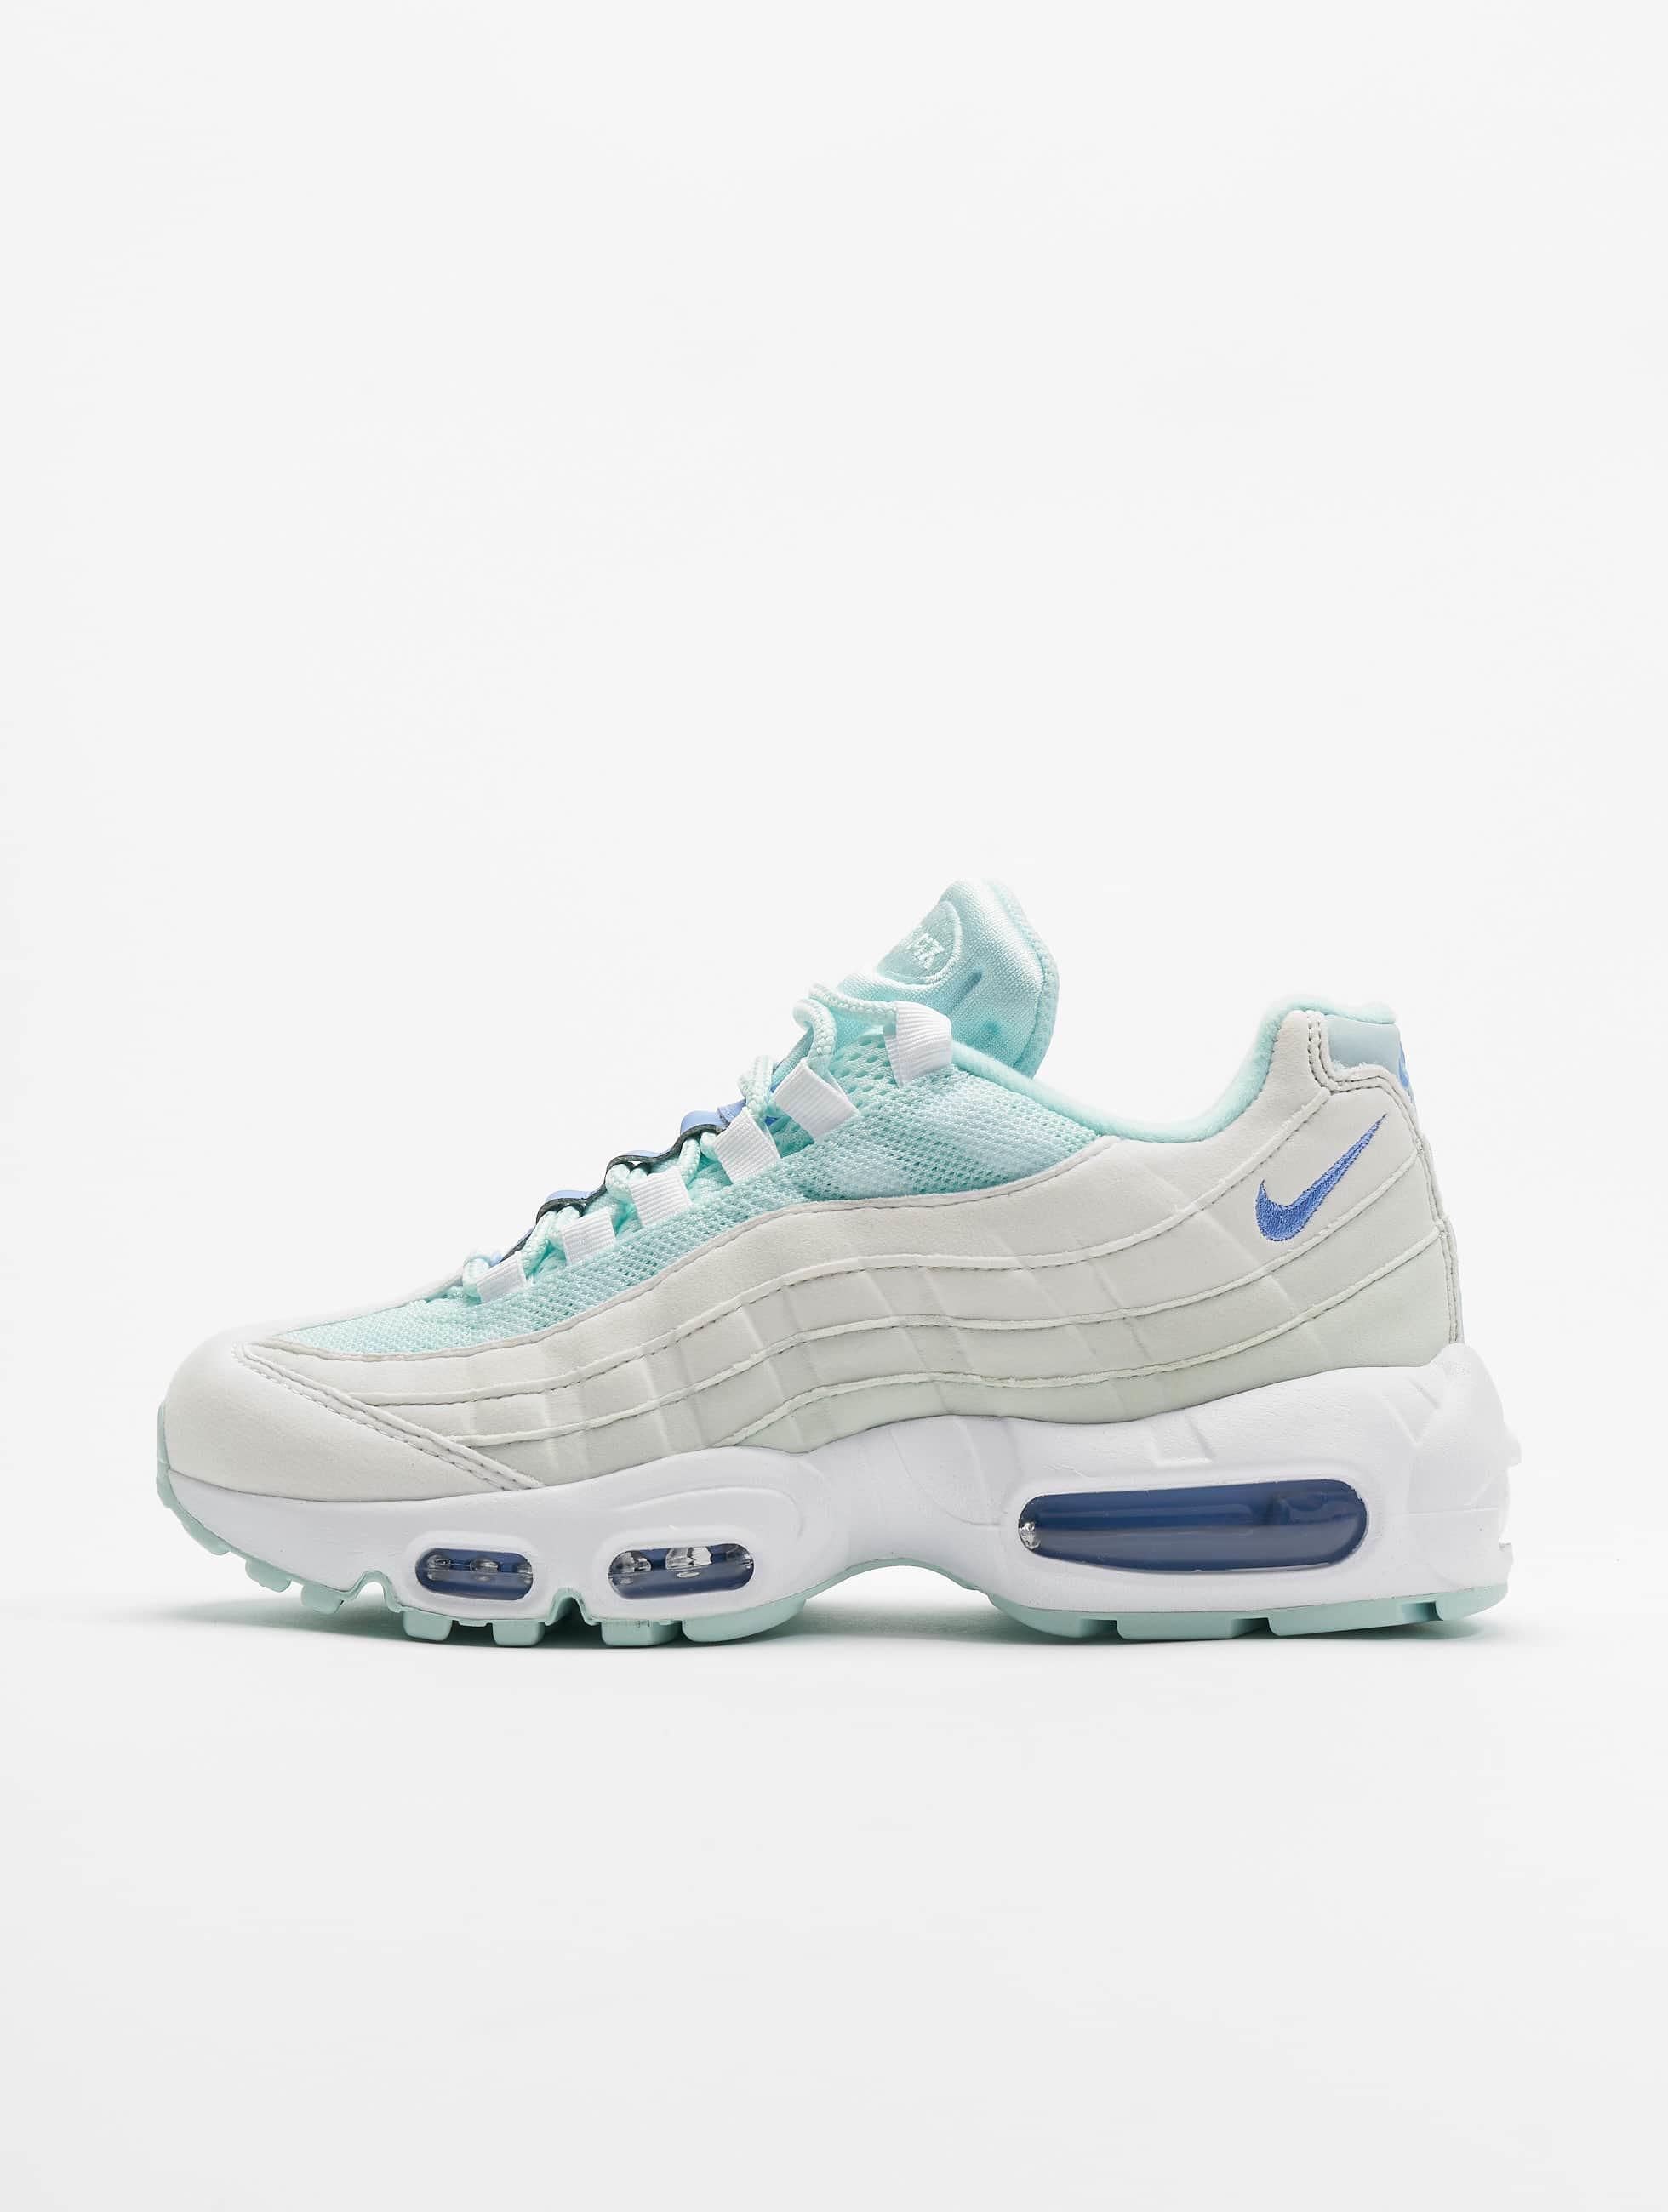 Nike Air Max 95 Sneakers Teal TintRoyal PulseWhiteSummit White